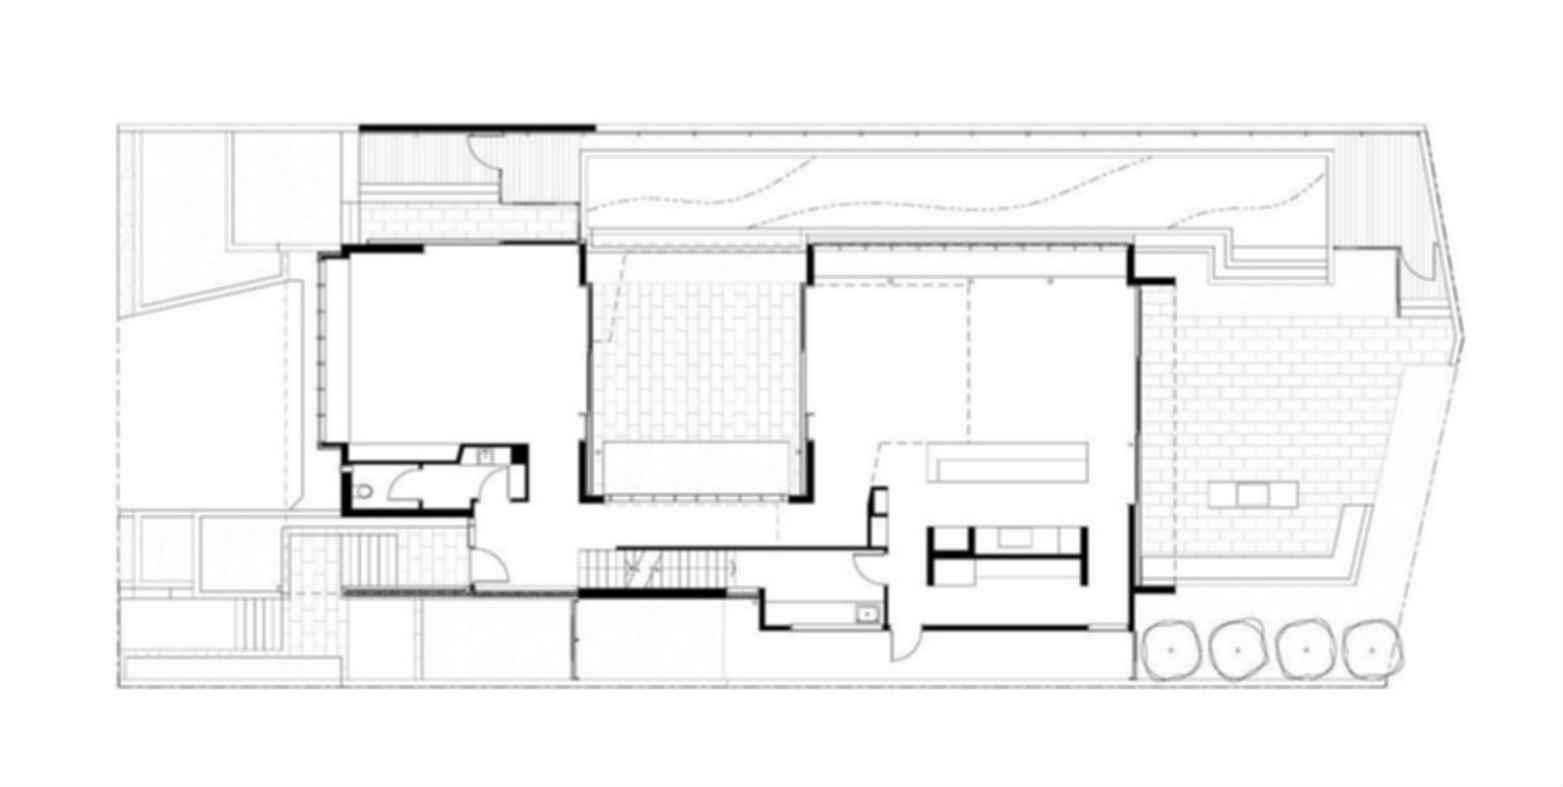 Elysium - Site plan